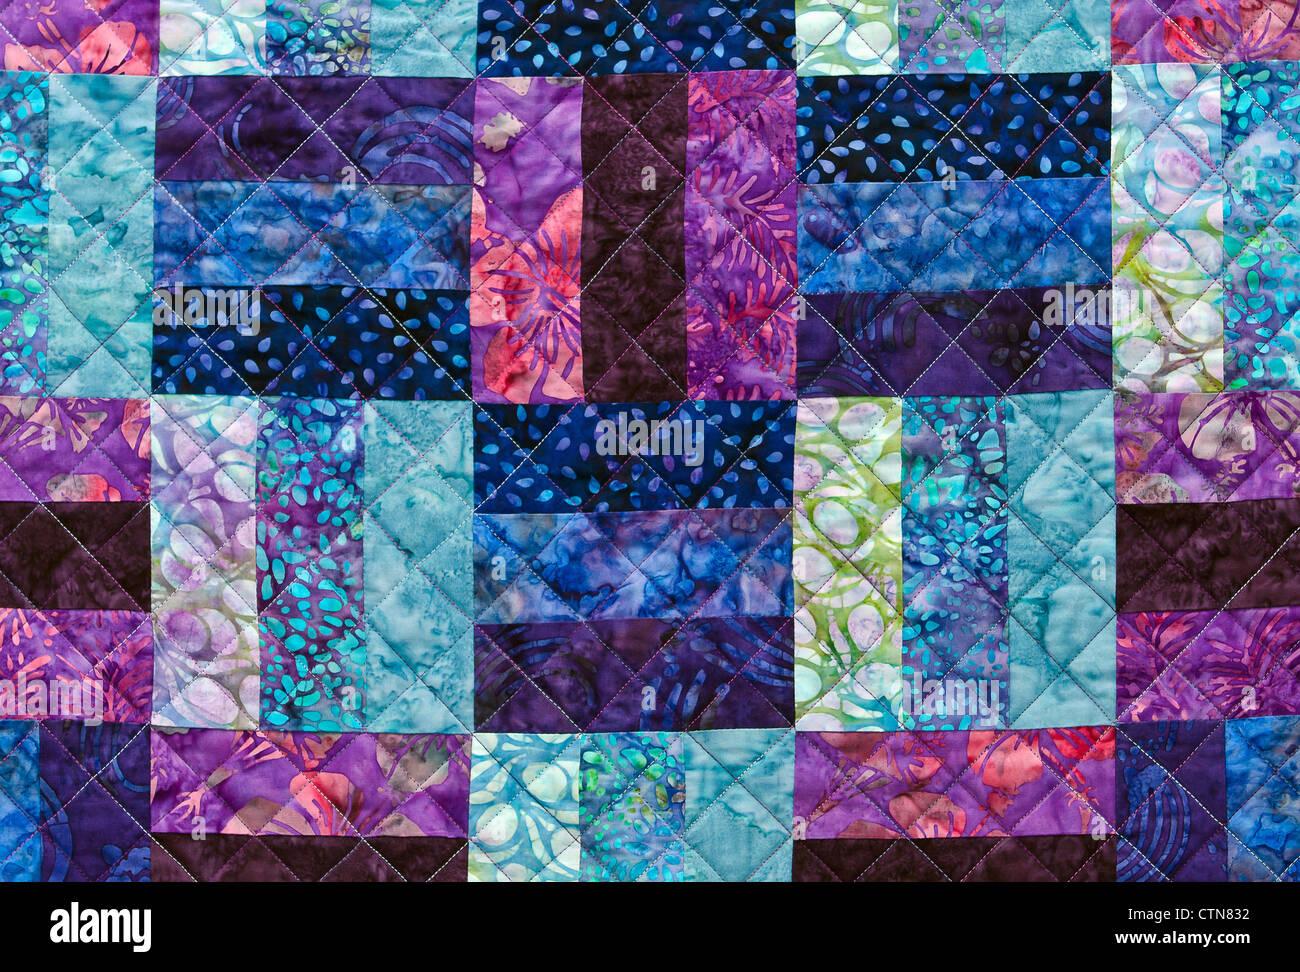 Bunte Quiltmuster Stockfoto, Bild: 49639830 - Alamy